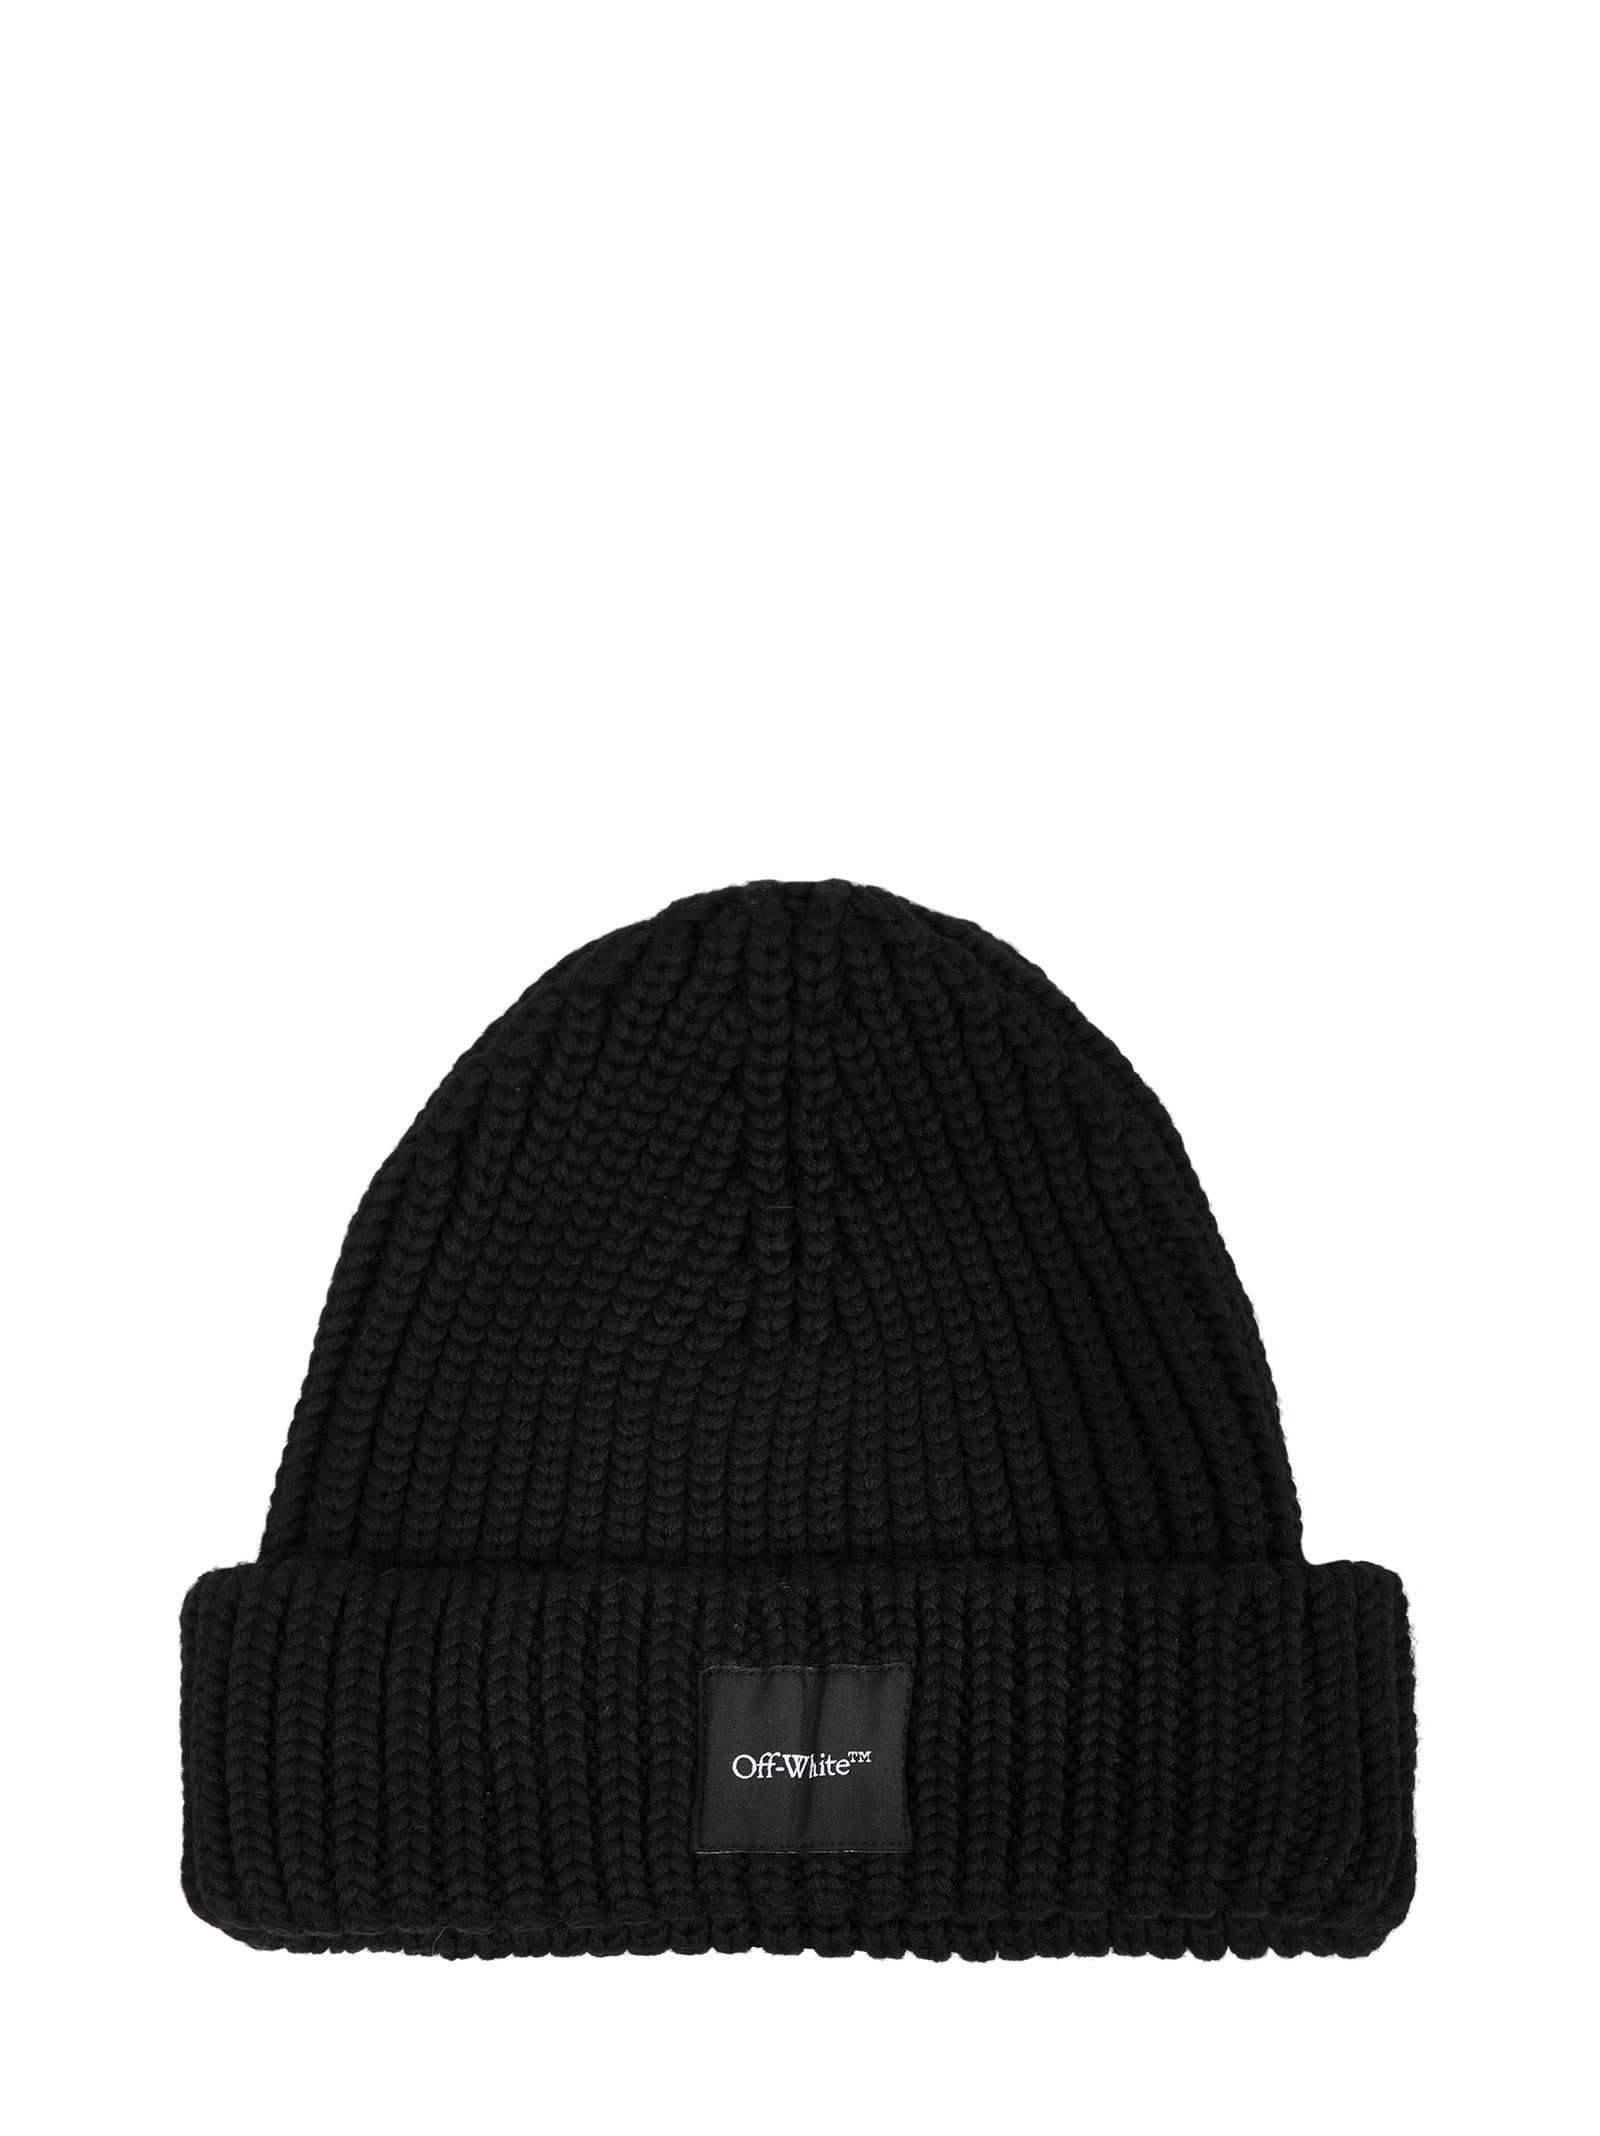 Off-White OFF-WHITE CAP